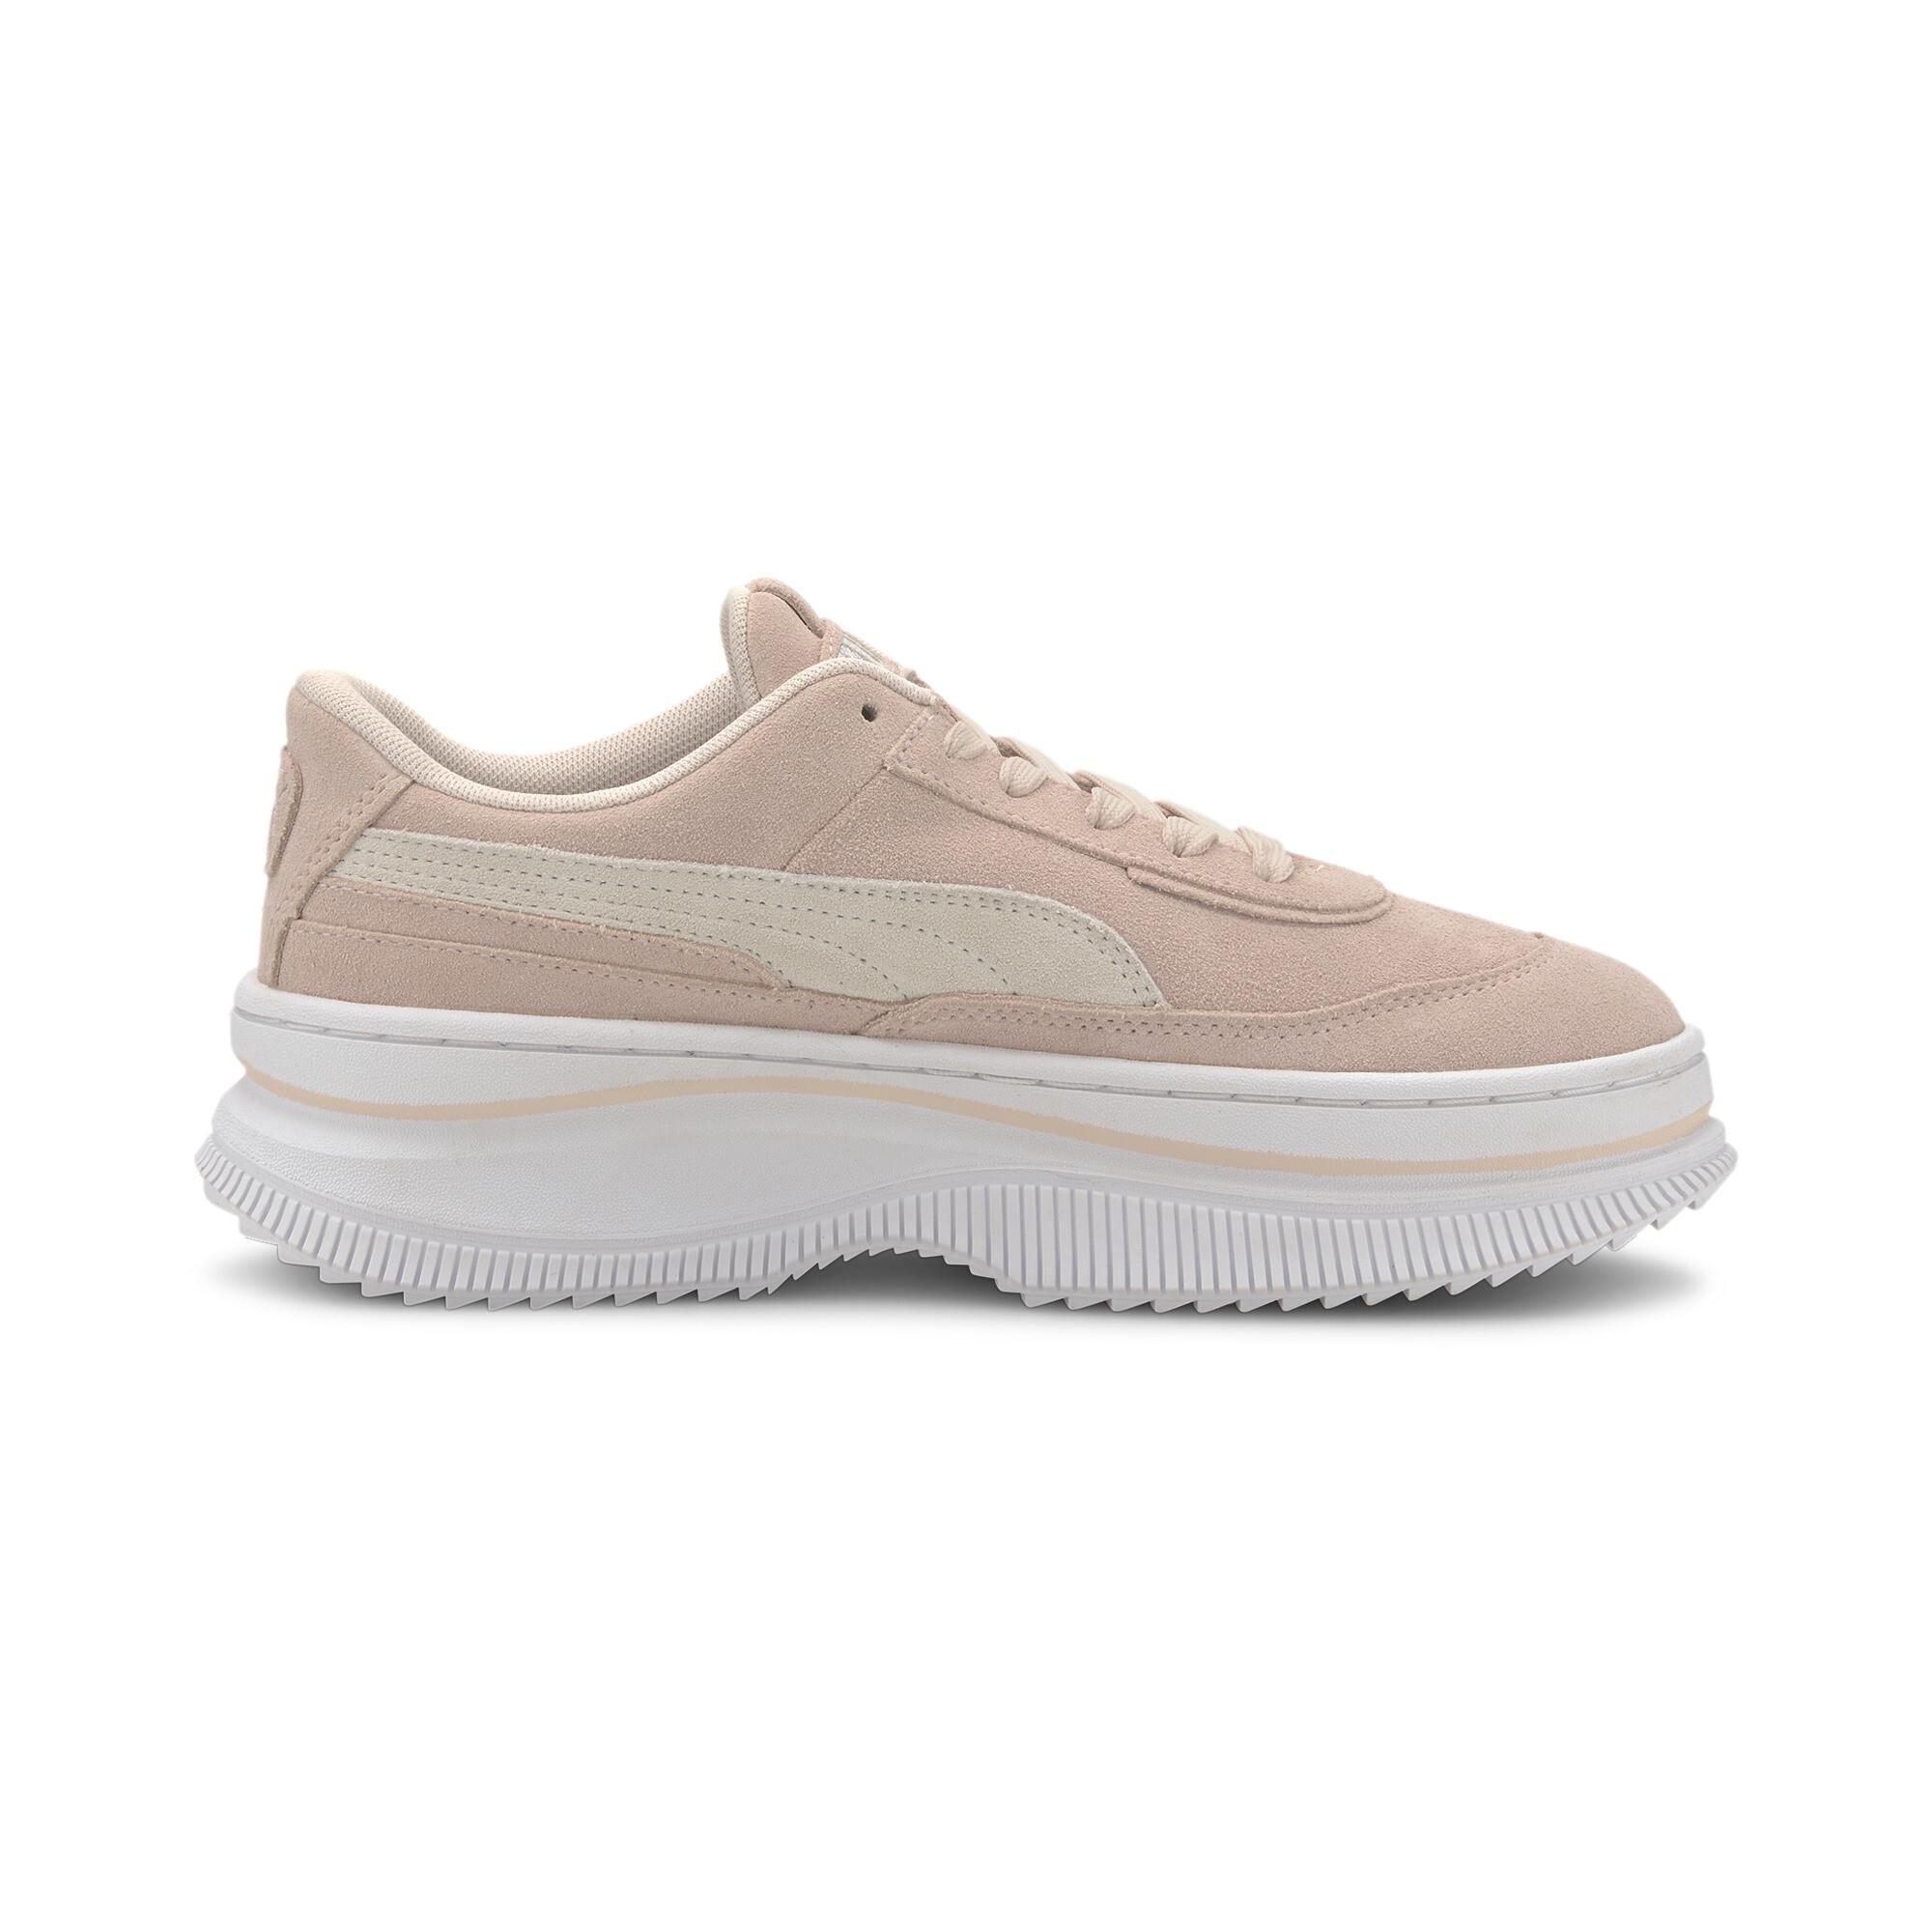 PUMA-Women-039-s-DEVA-Suede-Sneakers thumbnail 14